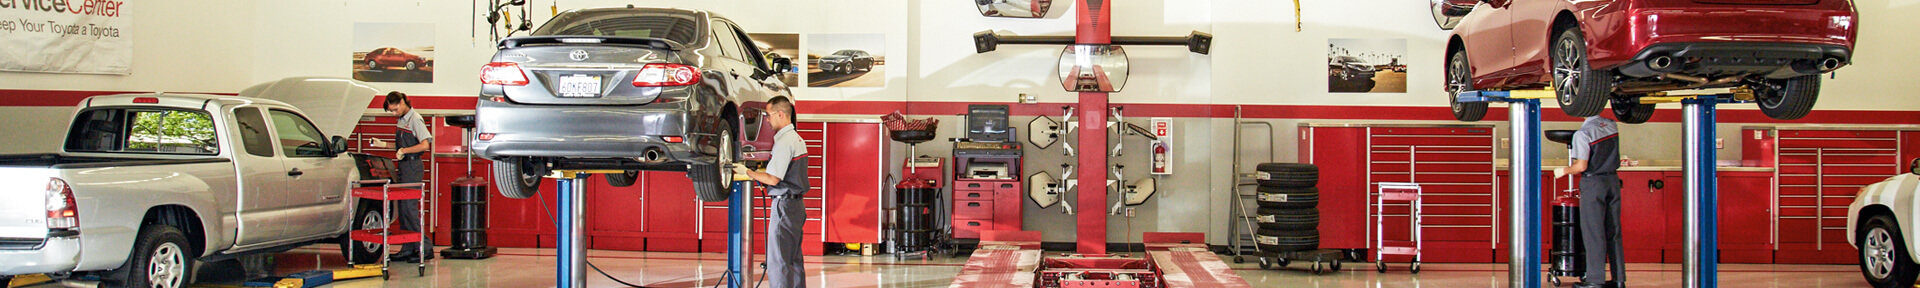 Service Center Image